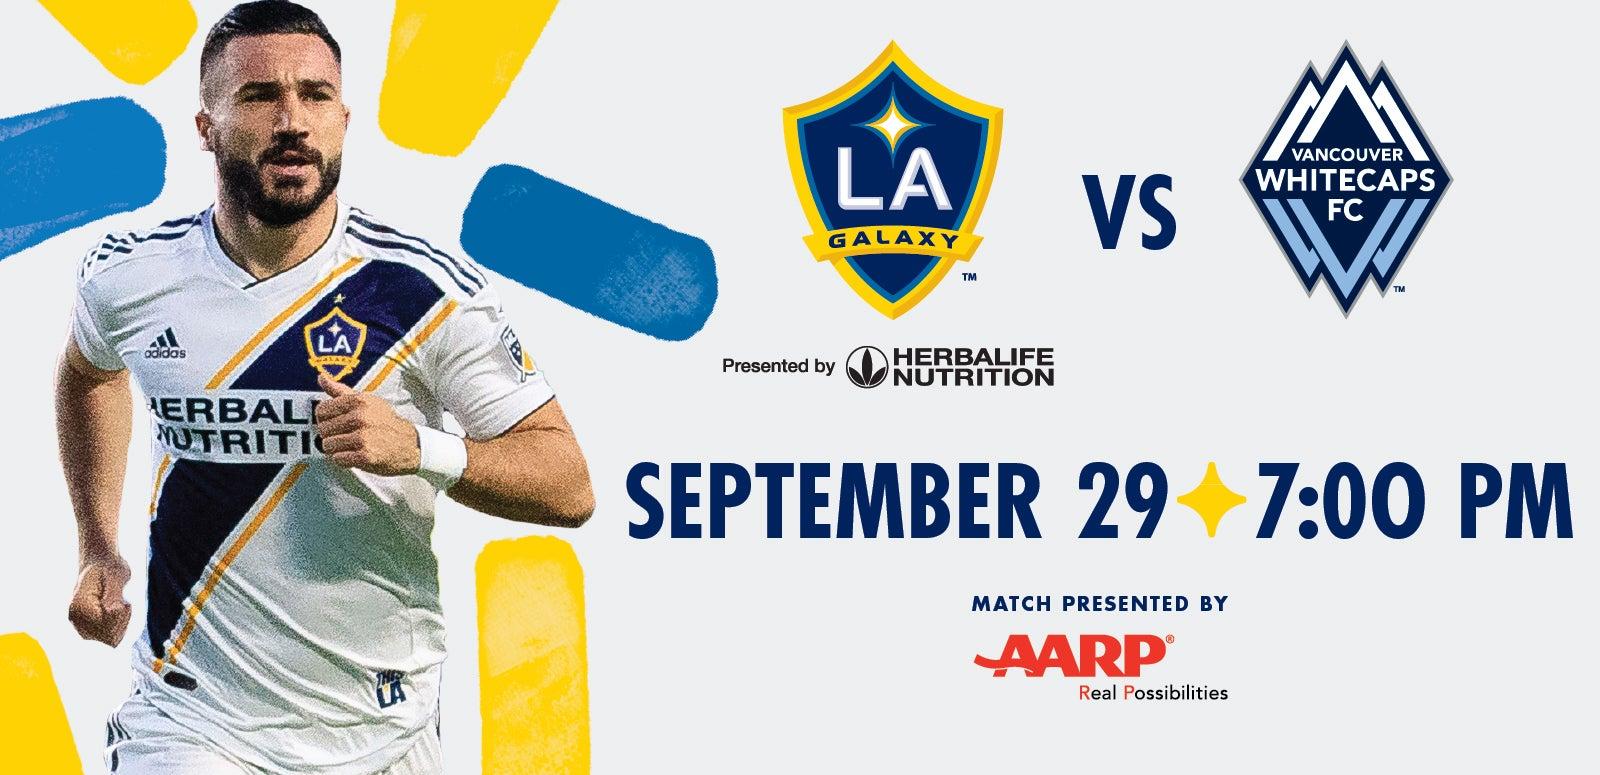 LA Galaxy vs. Vancouver Whitecaps FC